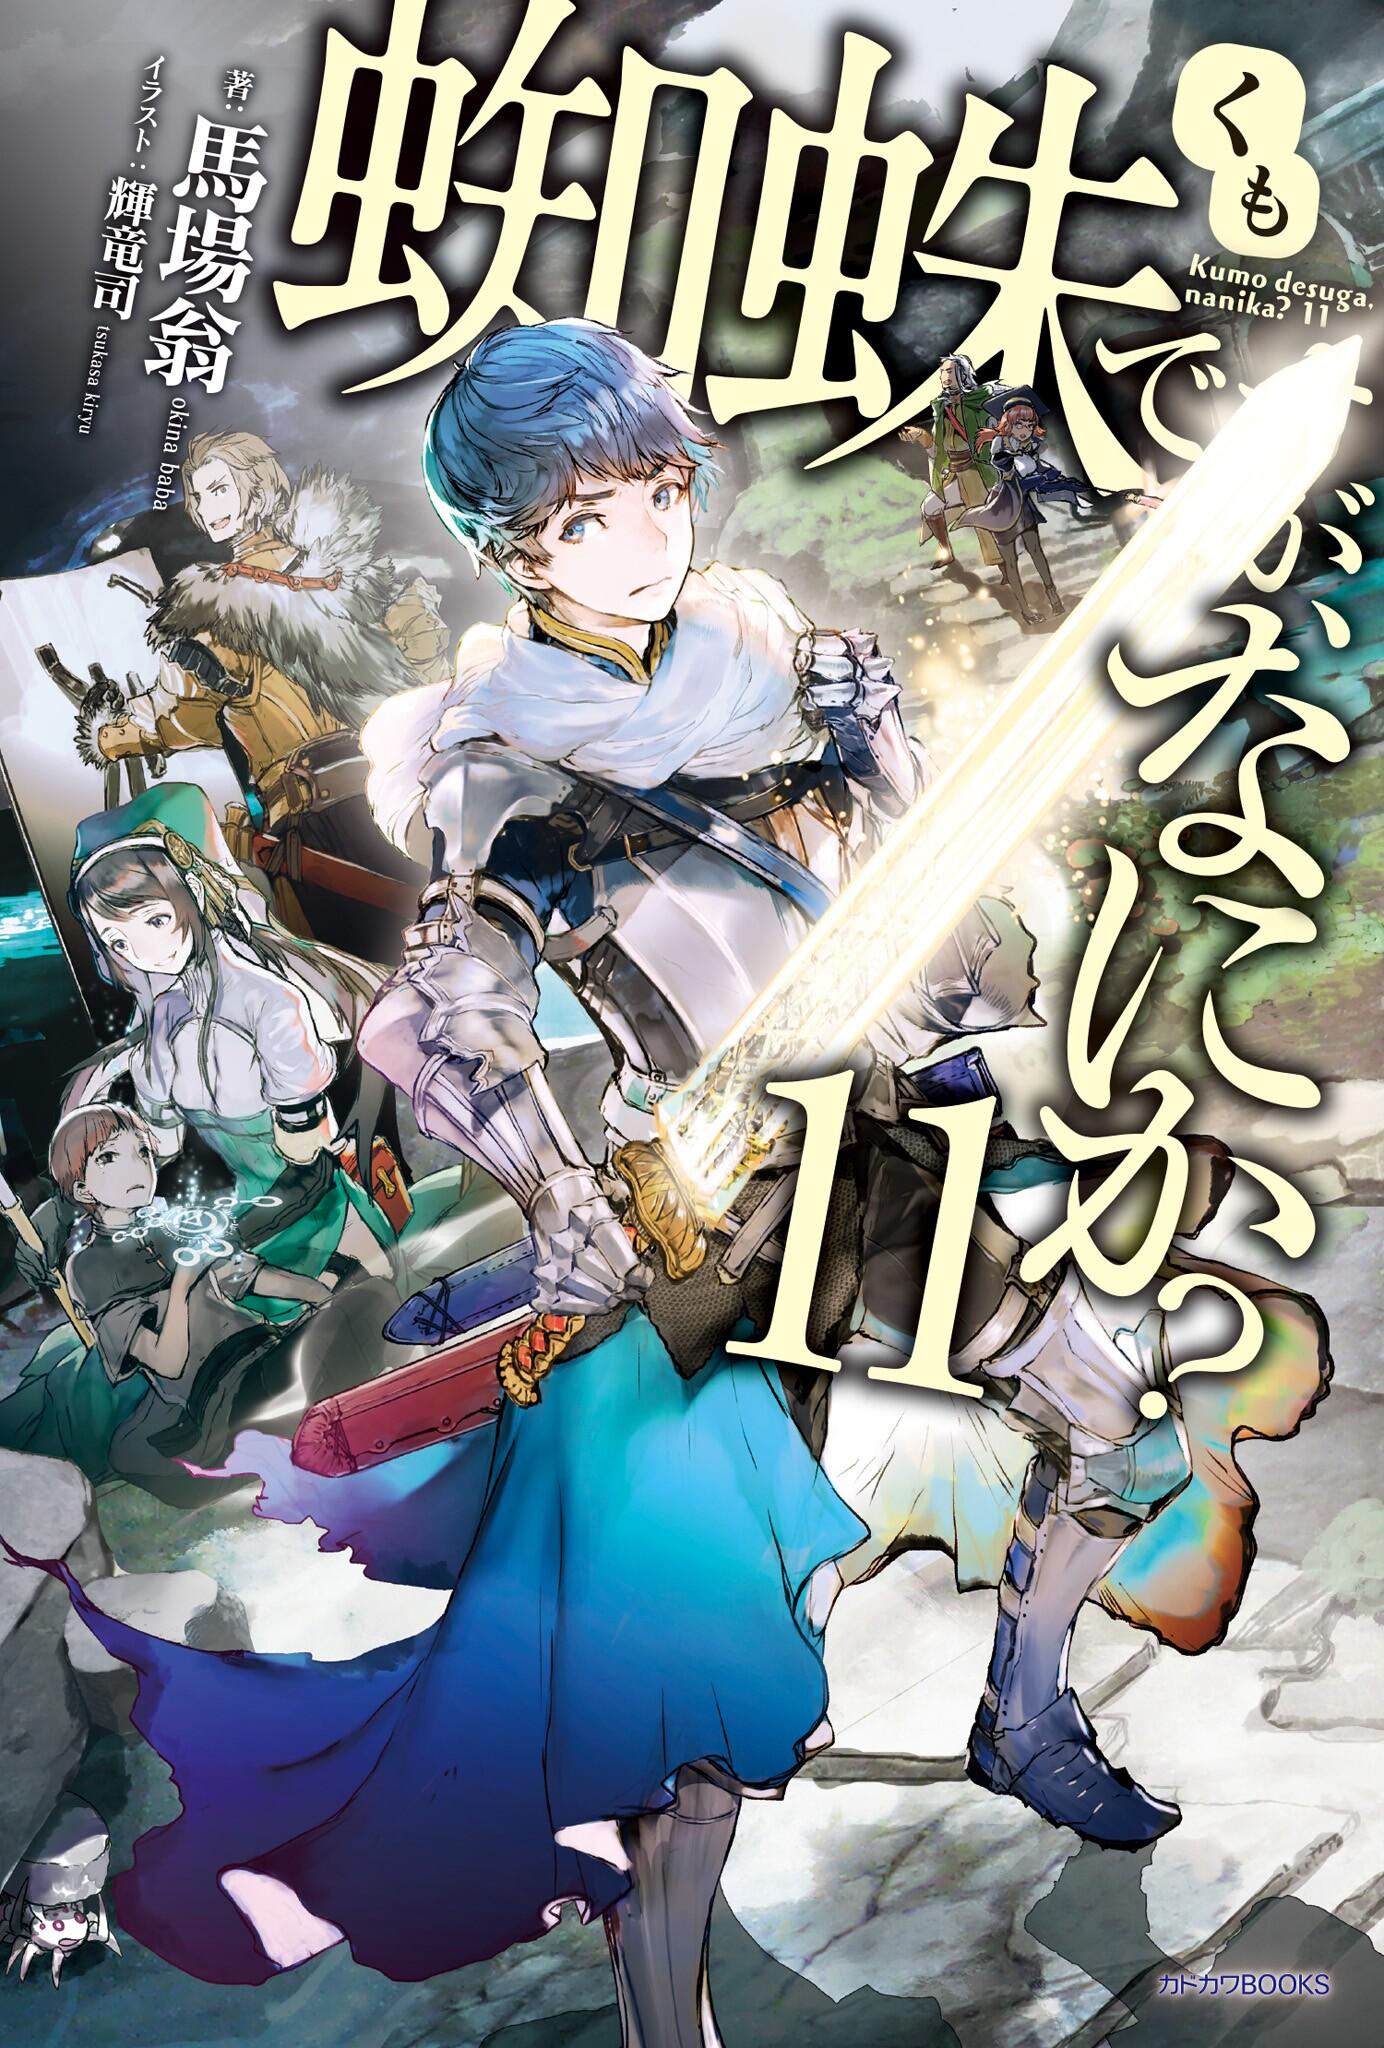 Light Novels - Volume 11 | Kumo Desu ga, Nani ka? Wikia | FANDOM